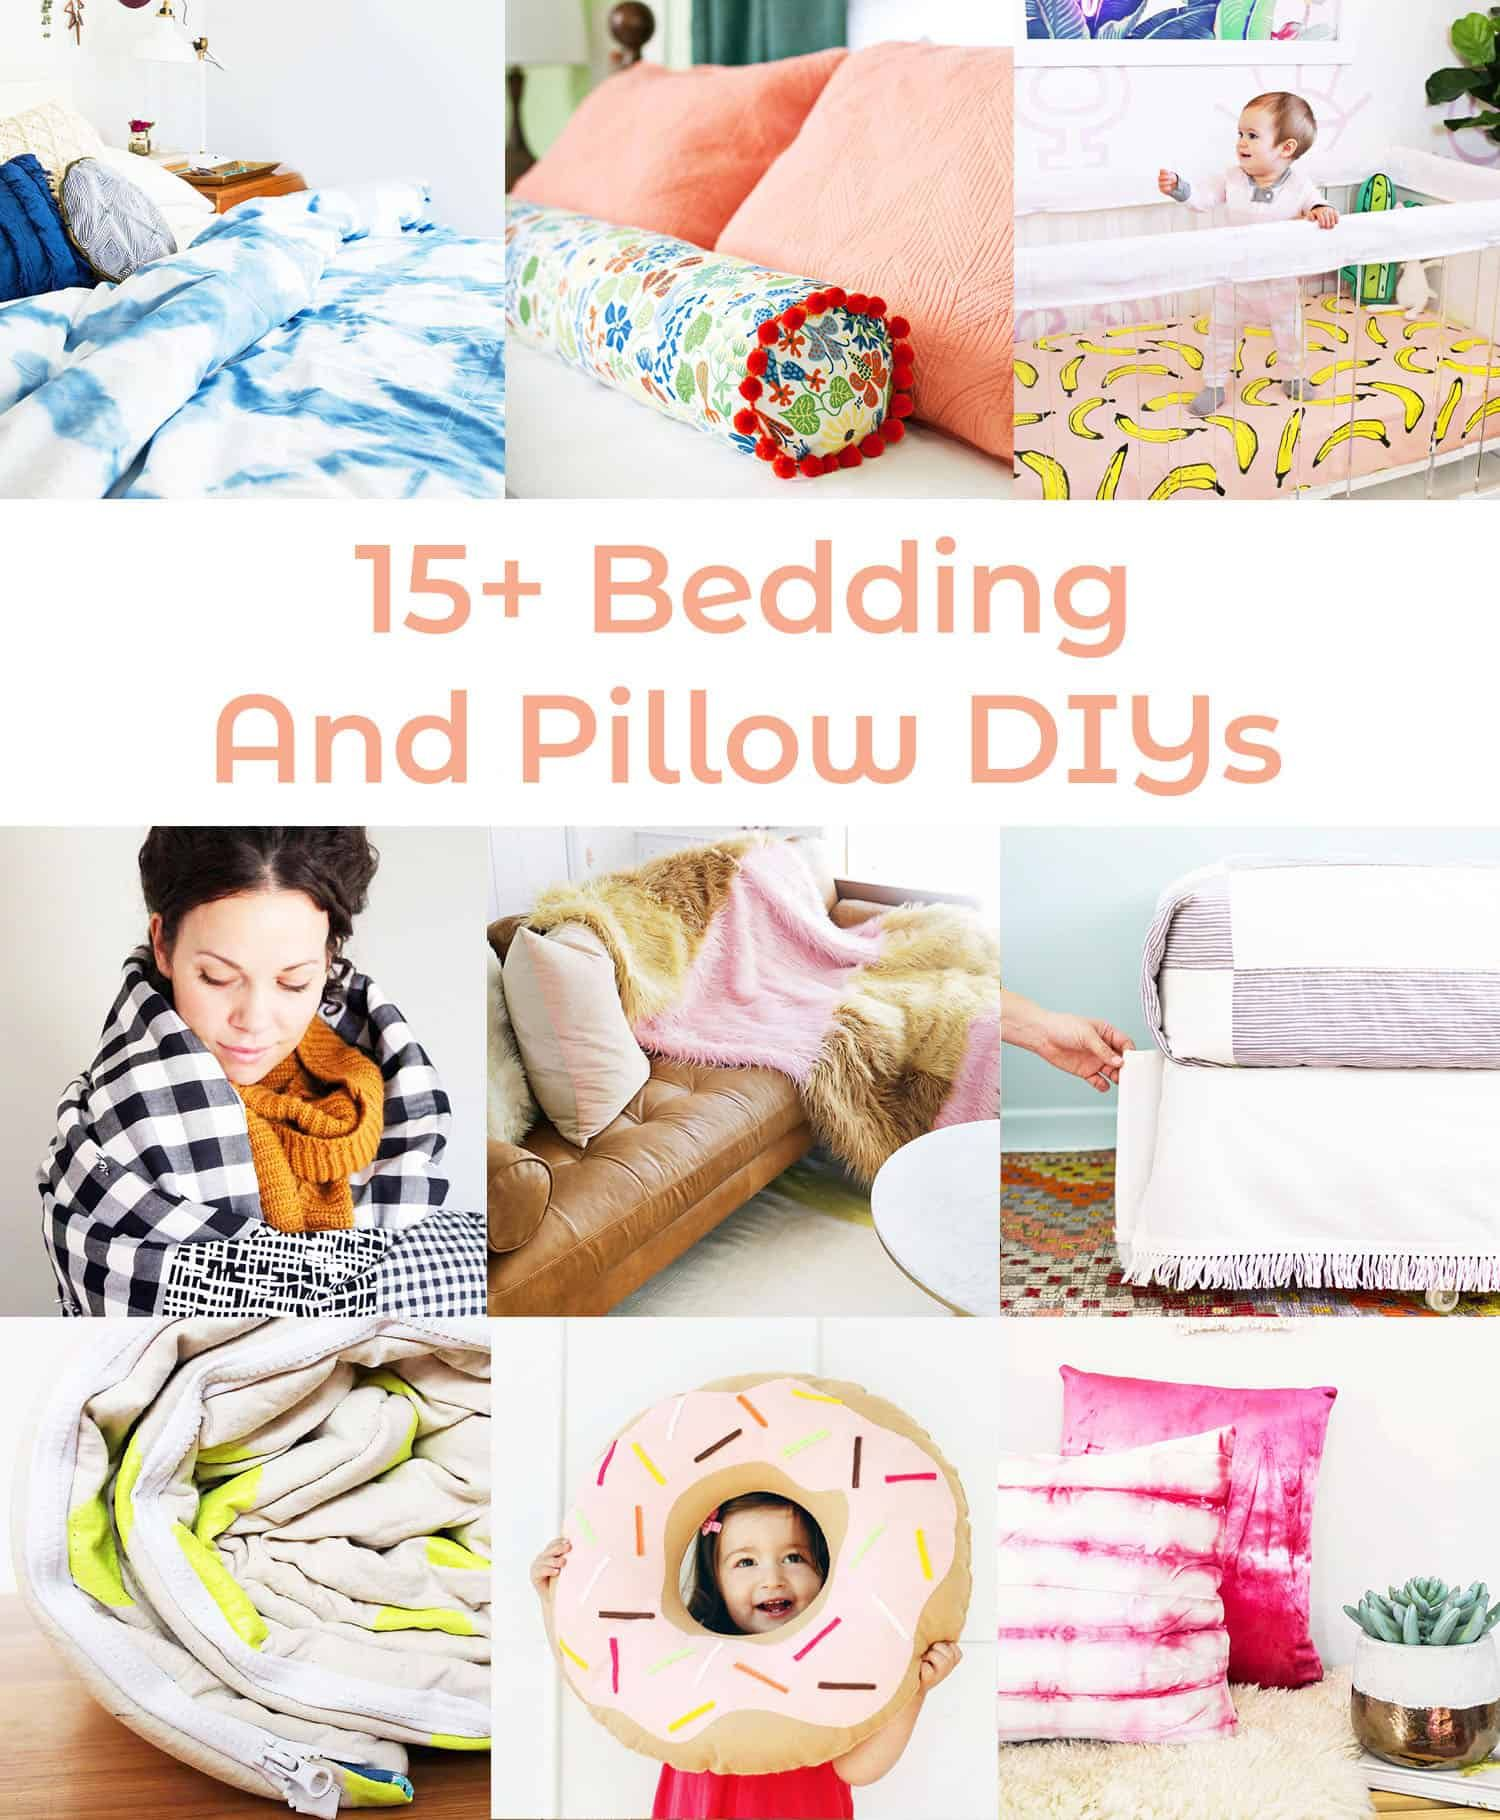 Pillow Talk: Our Favorite Bedding and Pillow DIYs - A Beautiful Mess